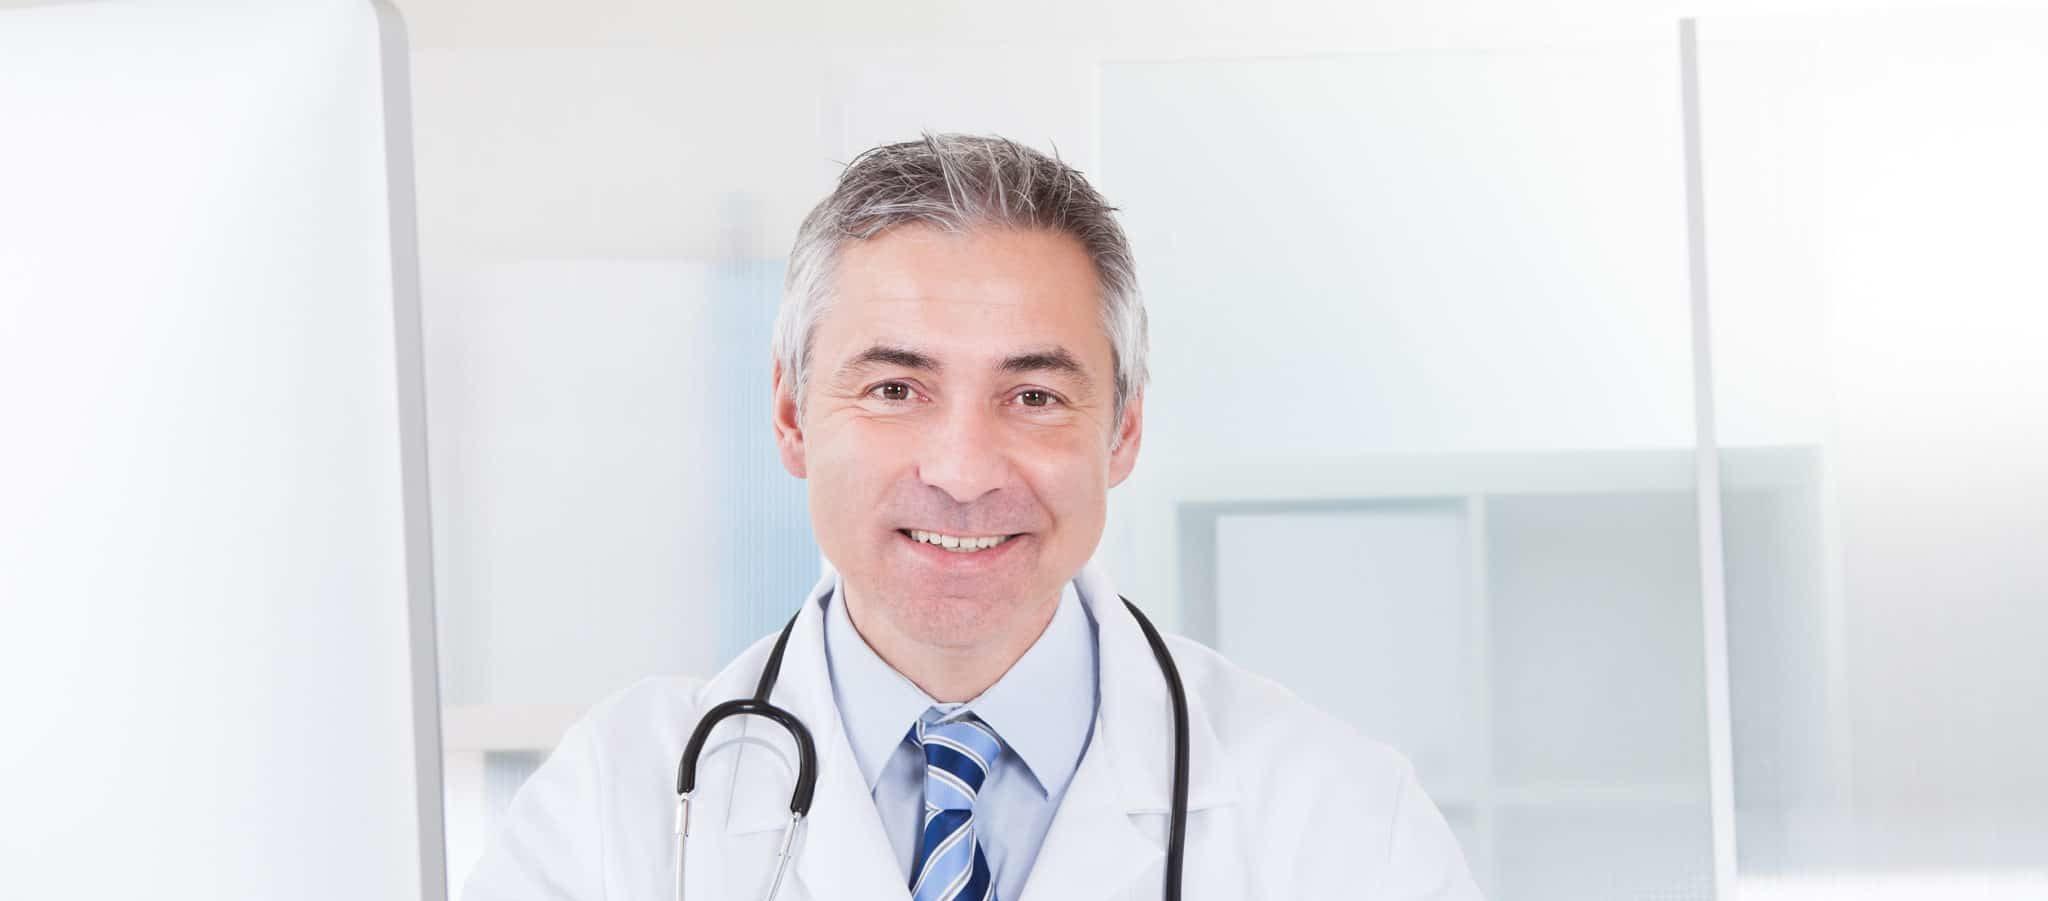 Progres assurance maladie